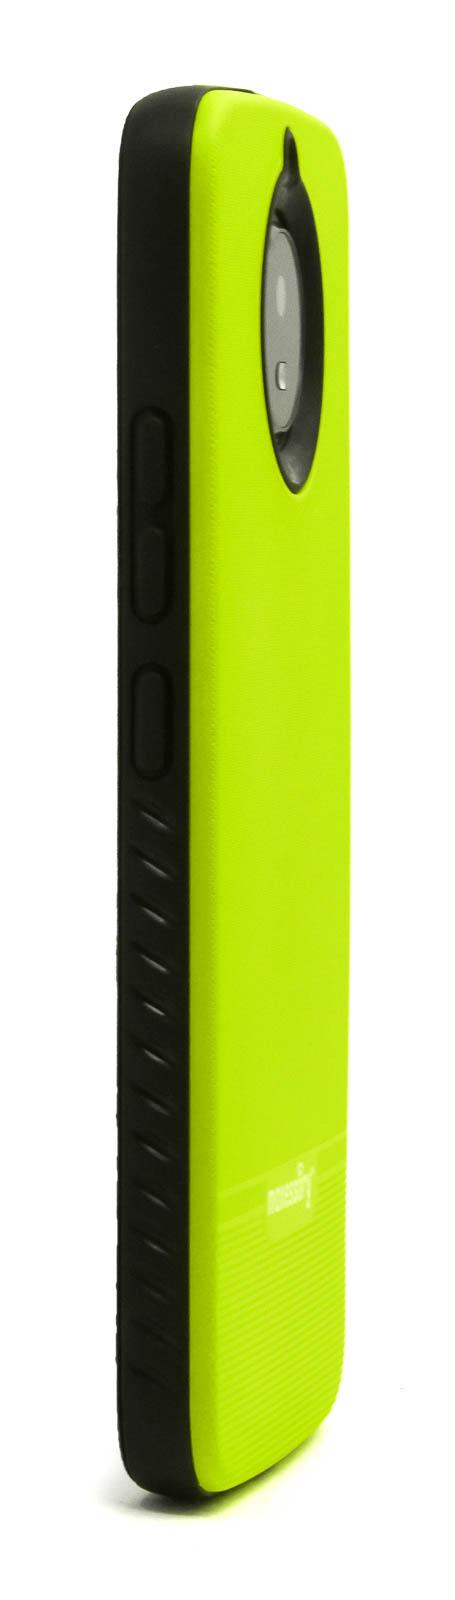 Moto-G5s-Case-Moto-G6-Case-Ultra-Thin-Hard-Body-Tactile-Shell-Cover thumbnail 19